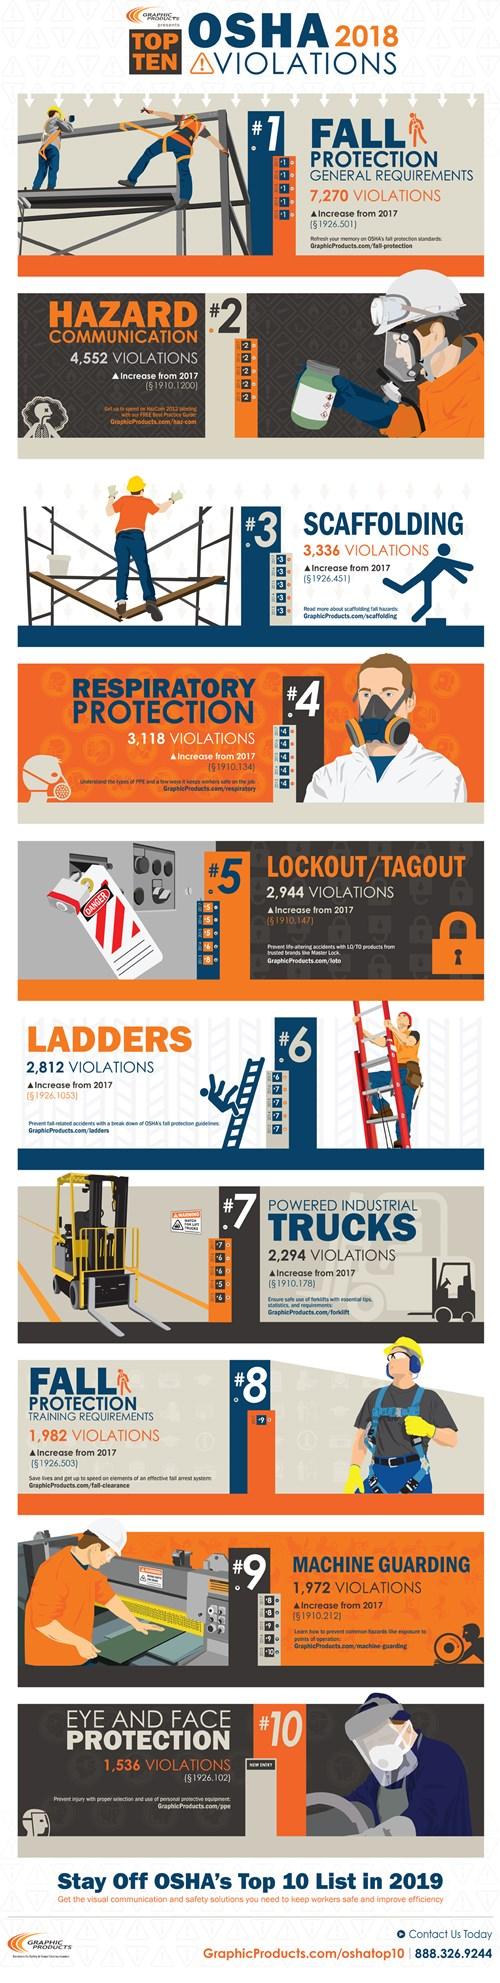 Infographic Top 10 OSHA Violations of 2018 Graphic